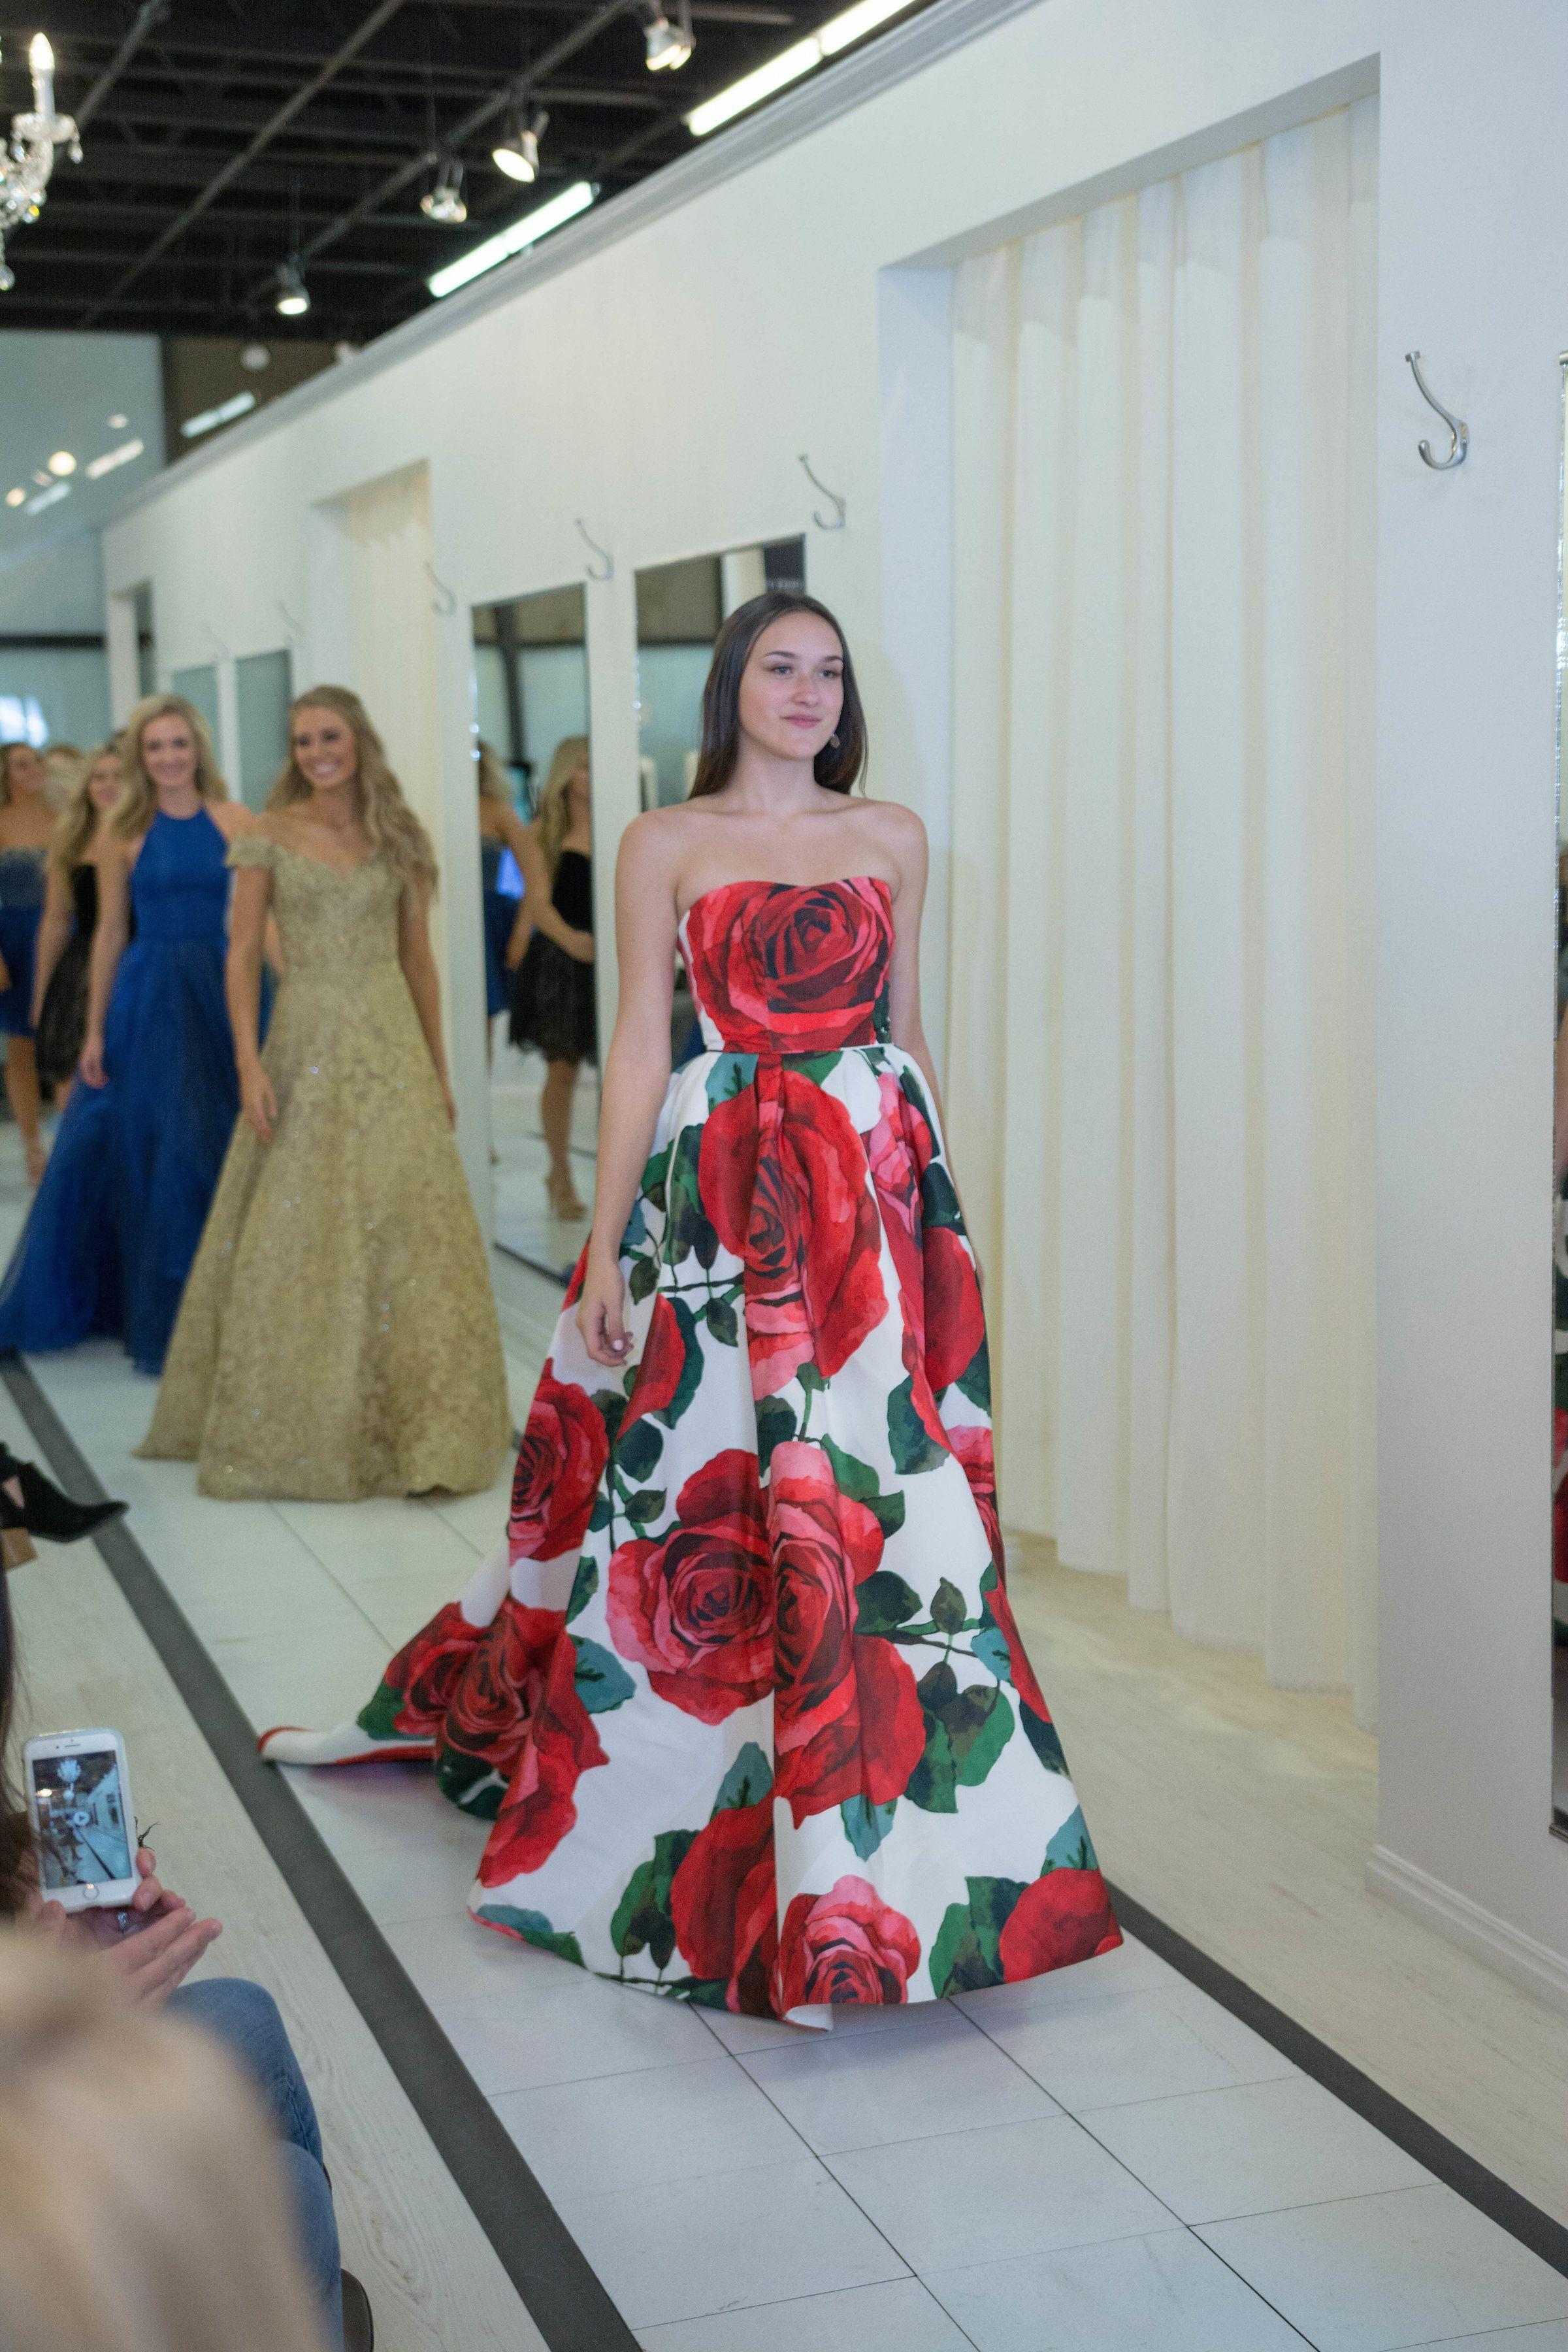 bbde40e2798 Sherri Hill Ypsilon Dresses Runway Strapless Ballgown Red Rose Floral Print  Ypsilon Dresses Prom Pageant Evening Wear Formal Formalwear High School  Dance ...